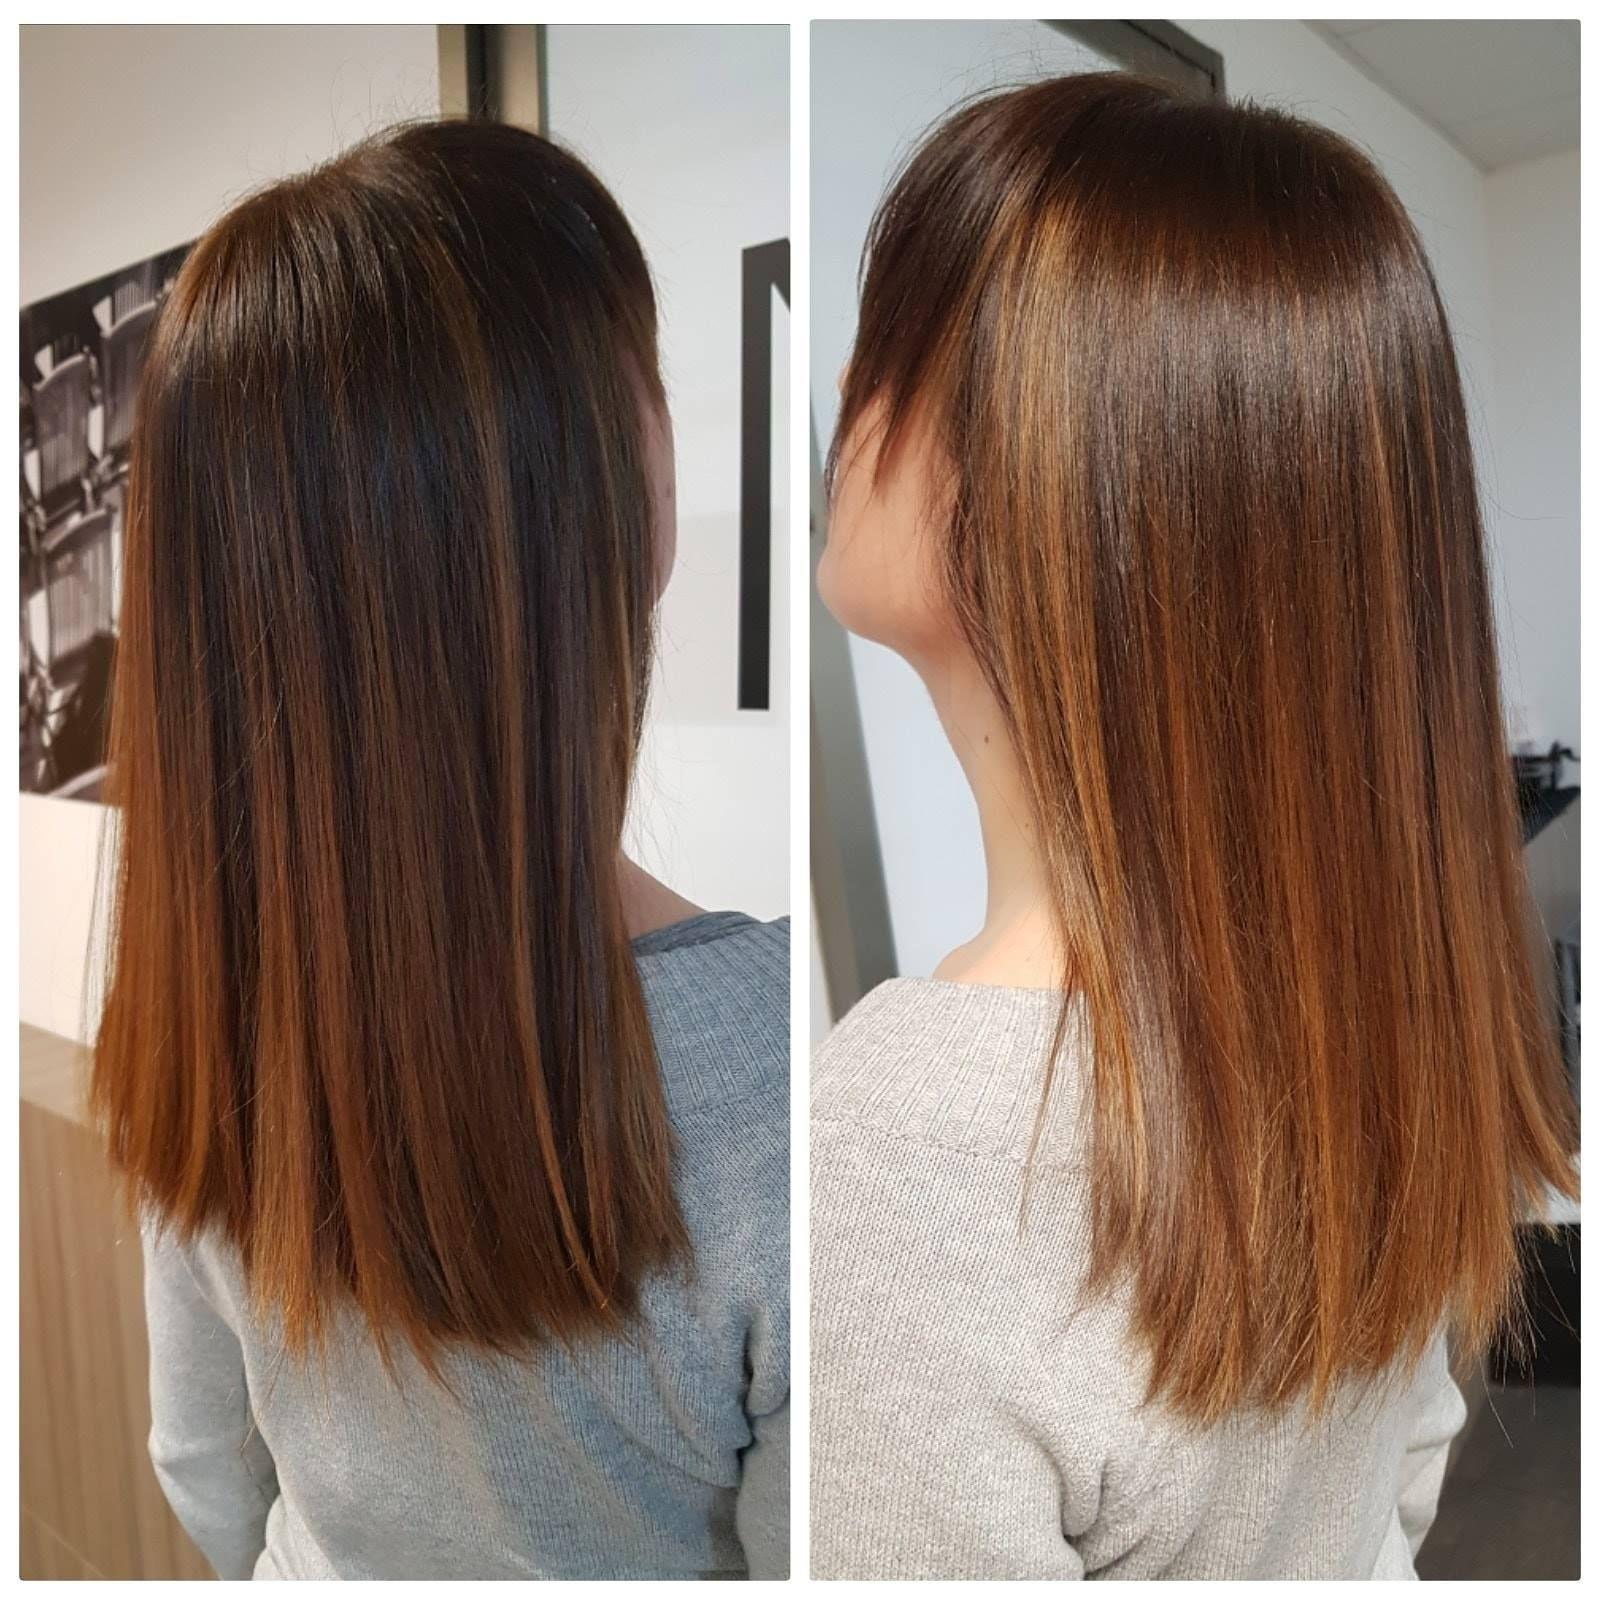 Tratamientos capilares para sanear tu cabello